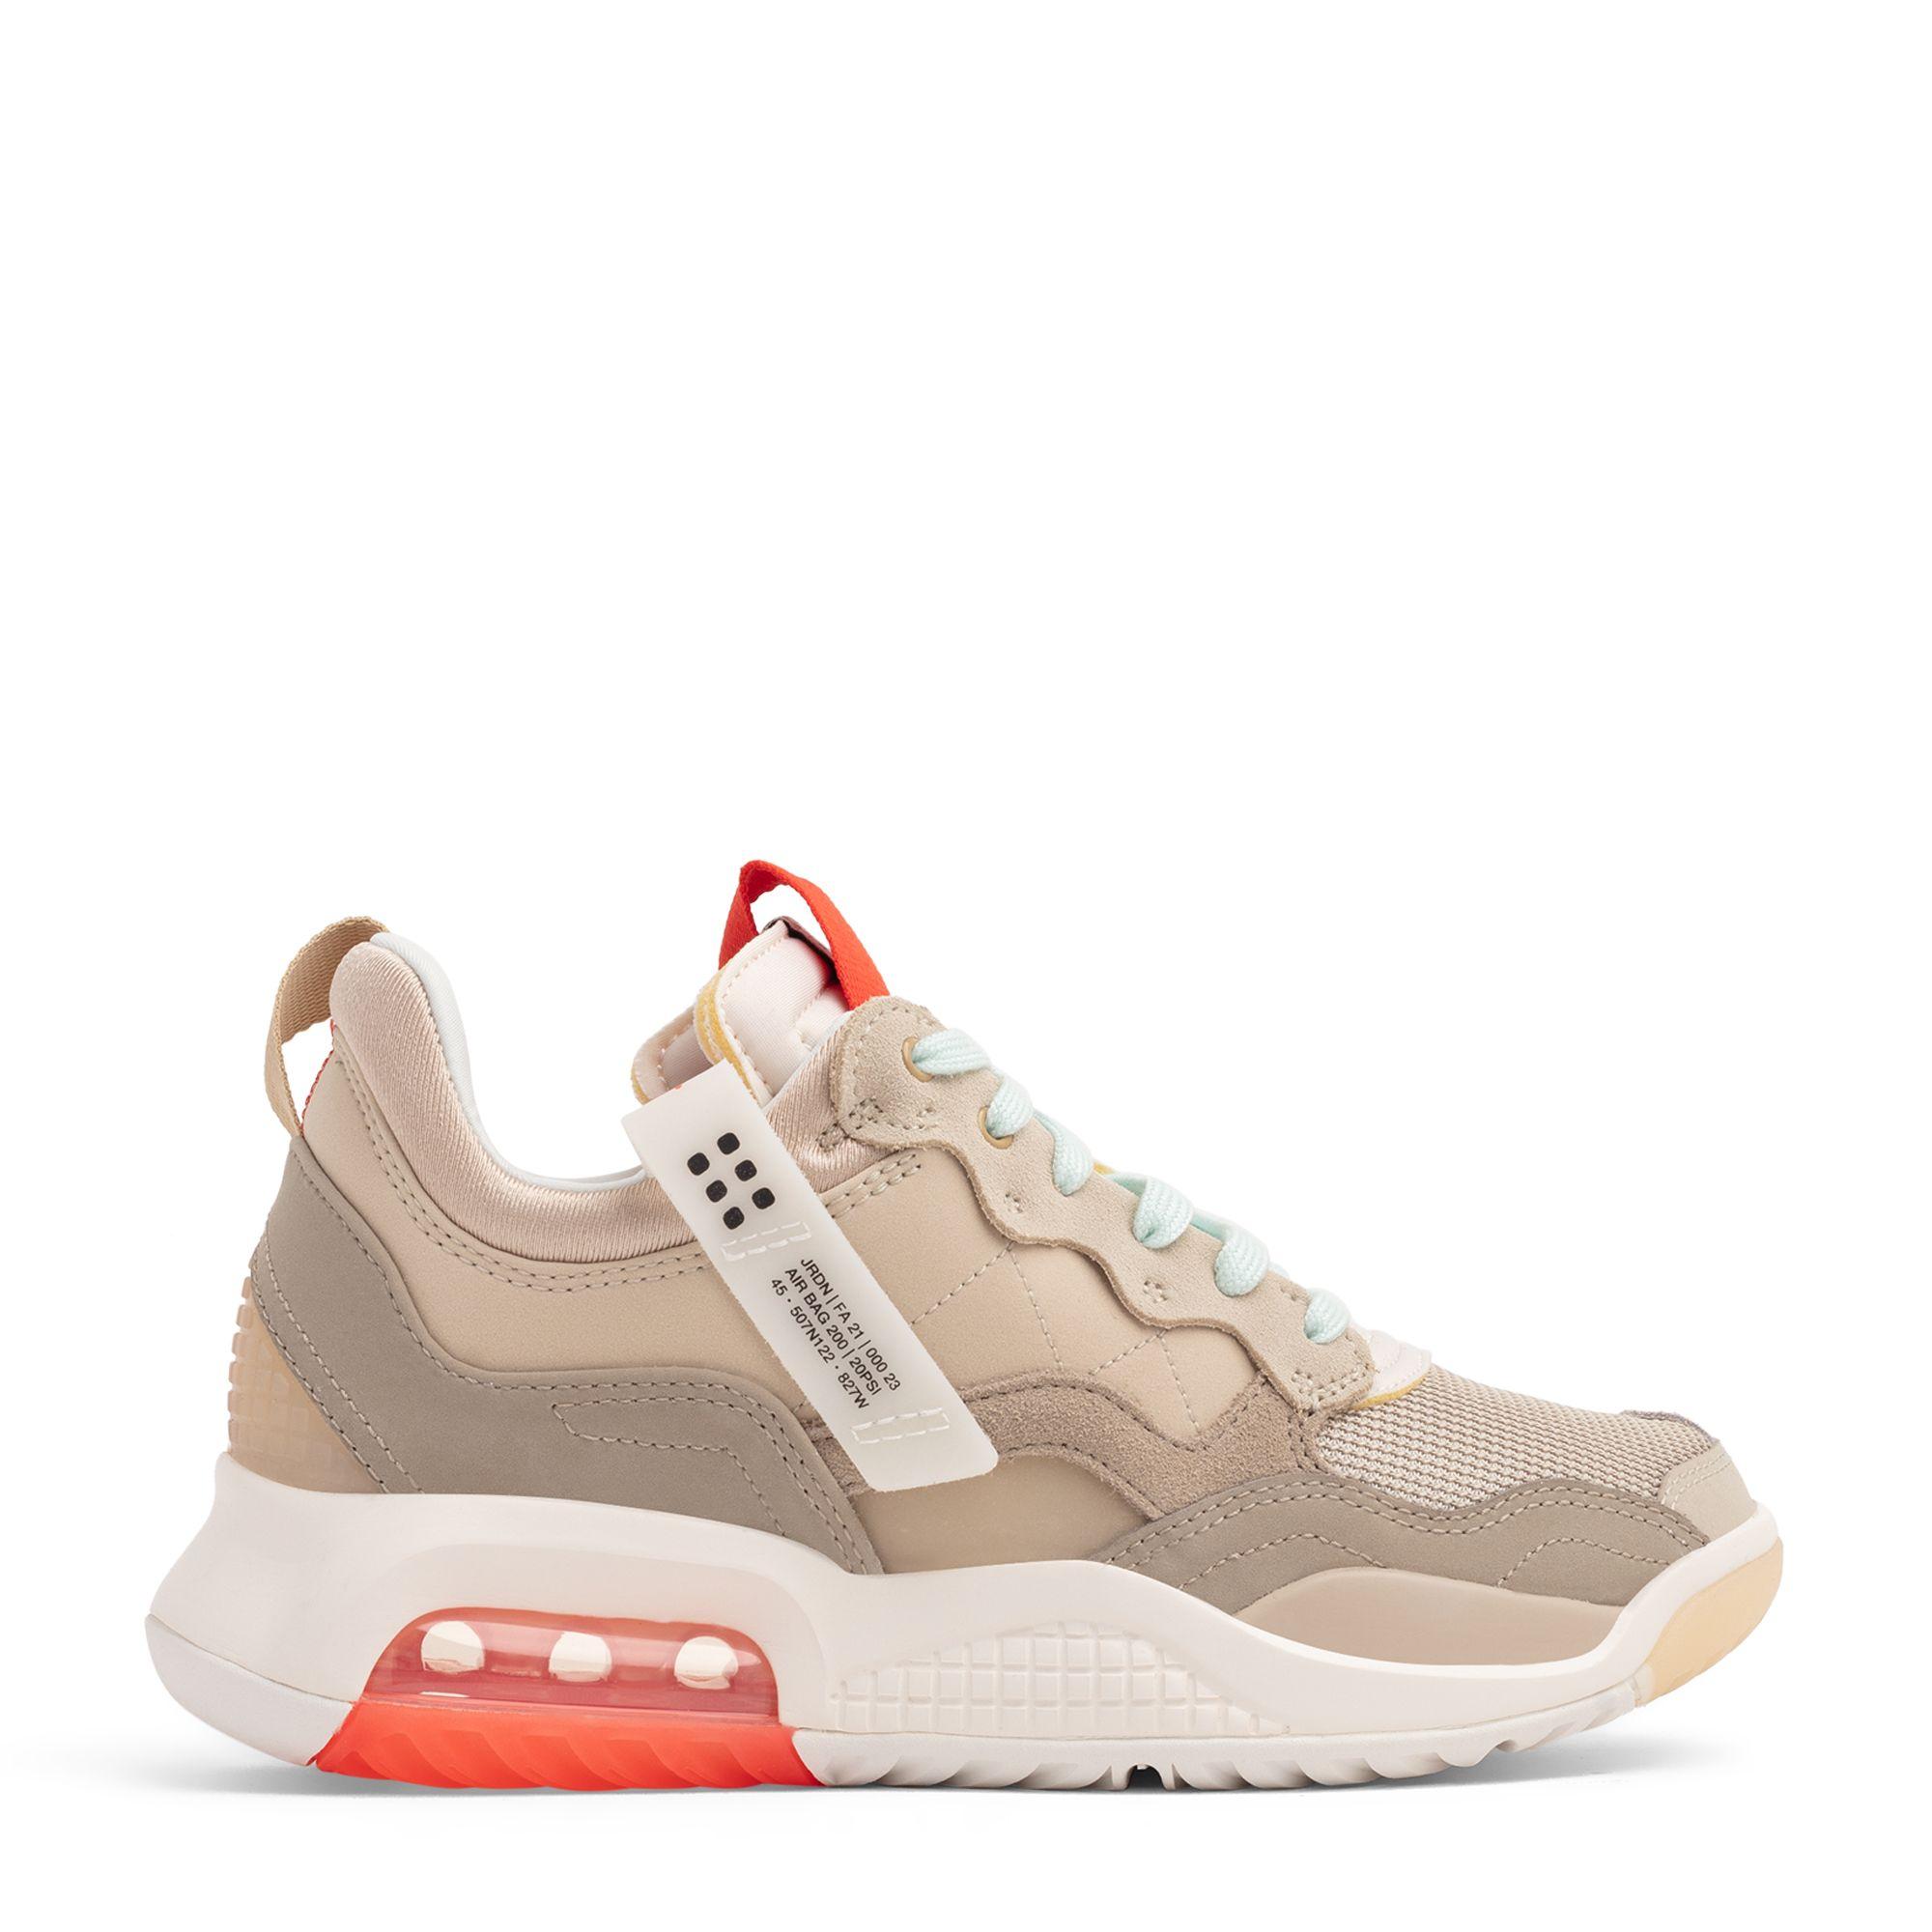 Jordan MA2 sneakers